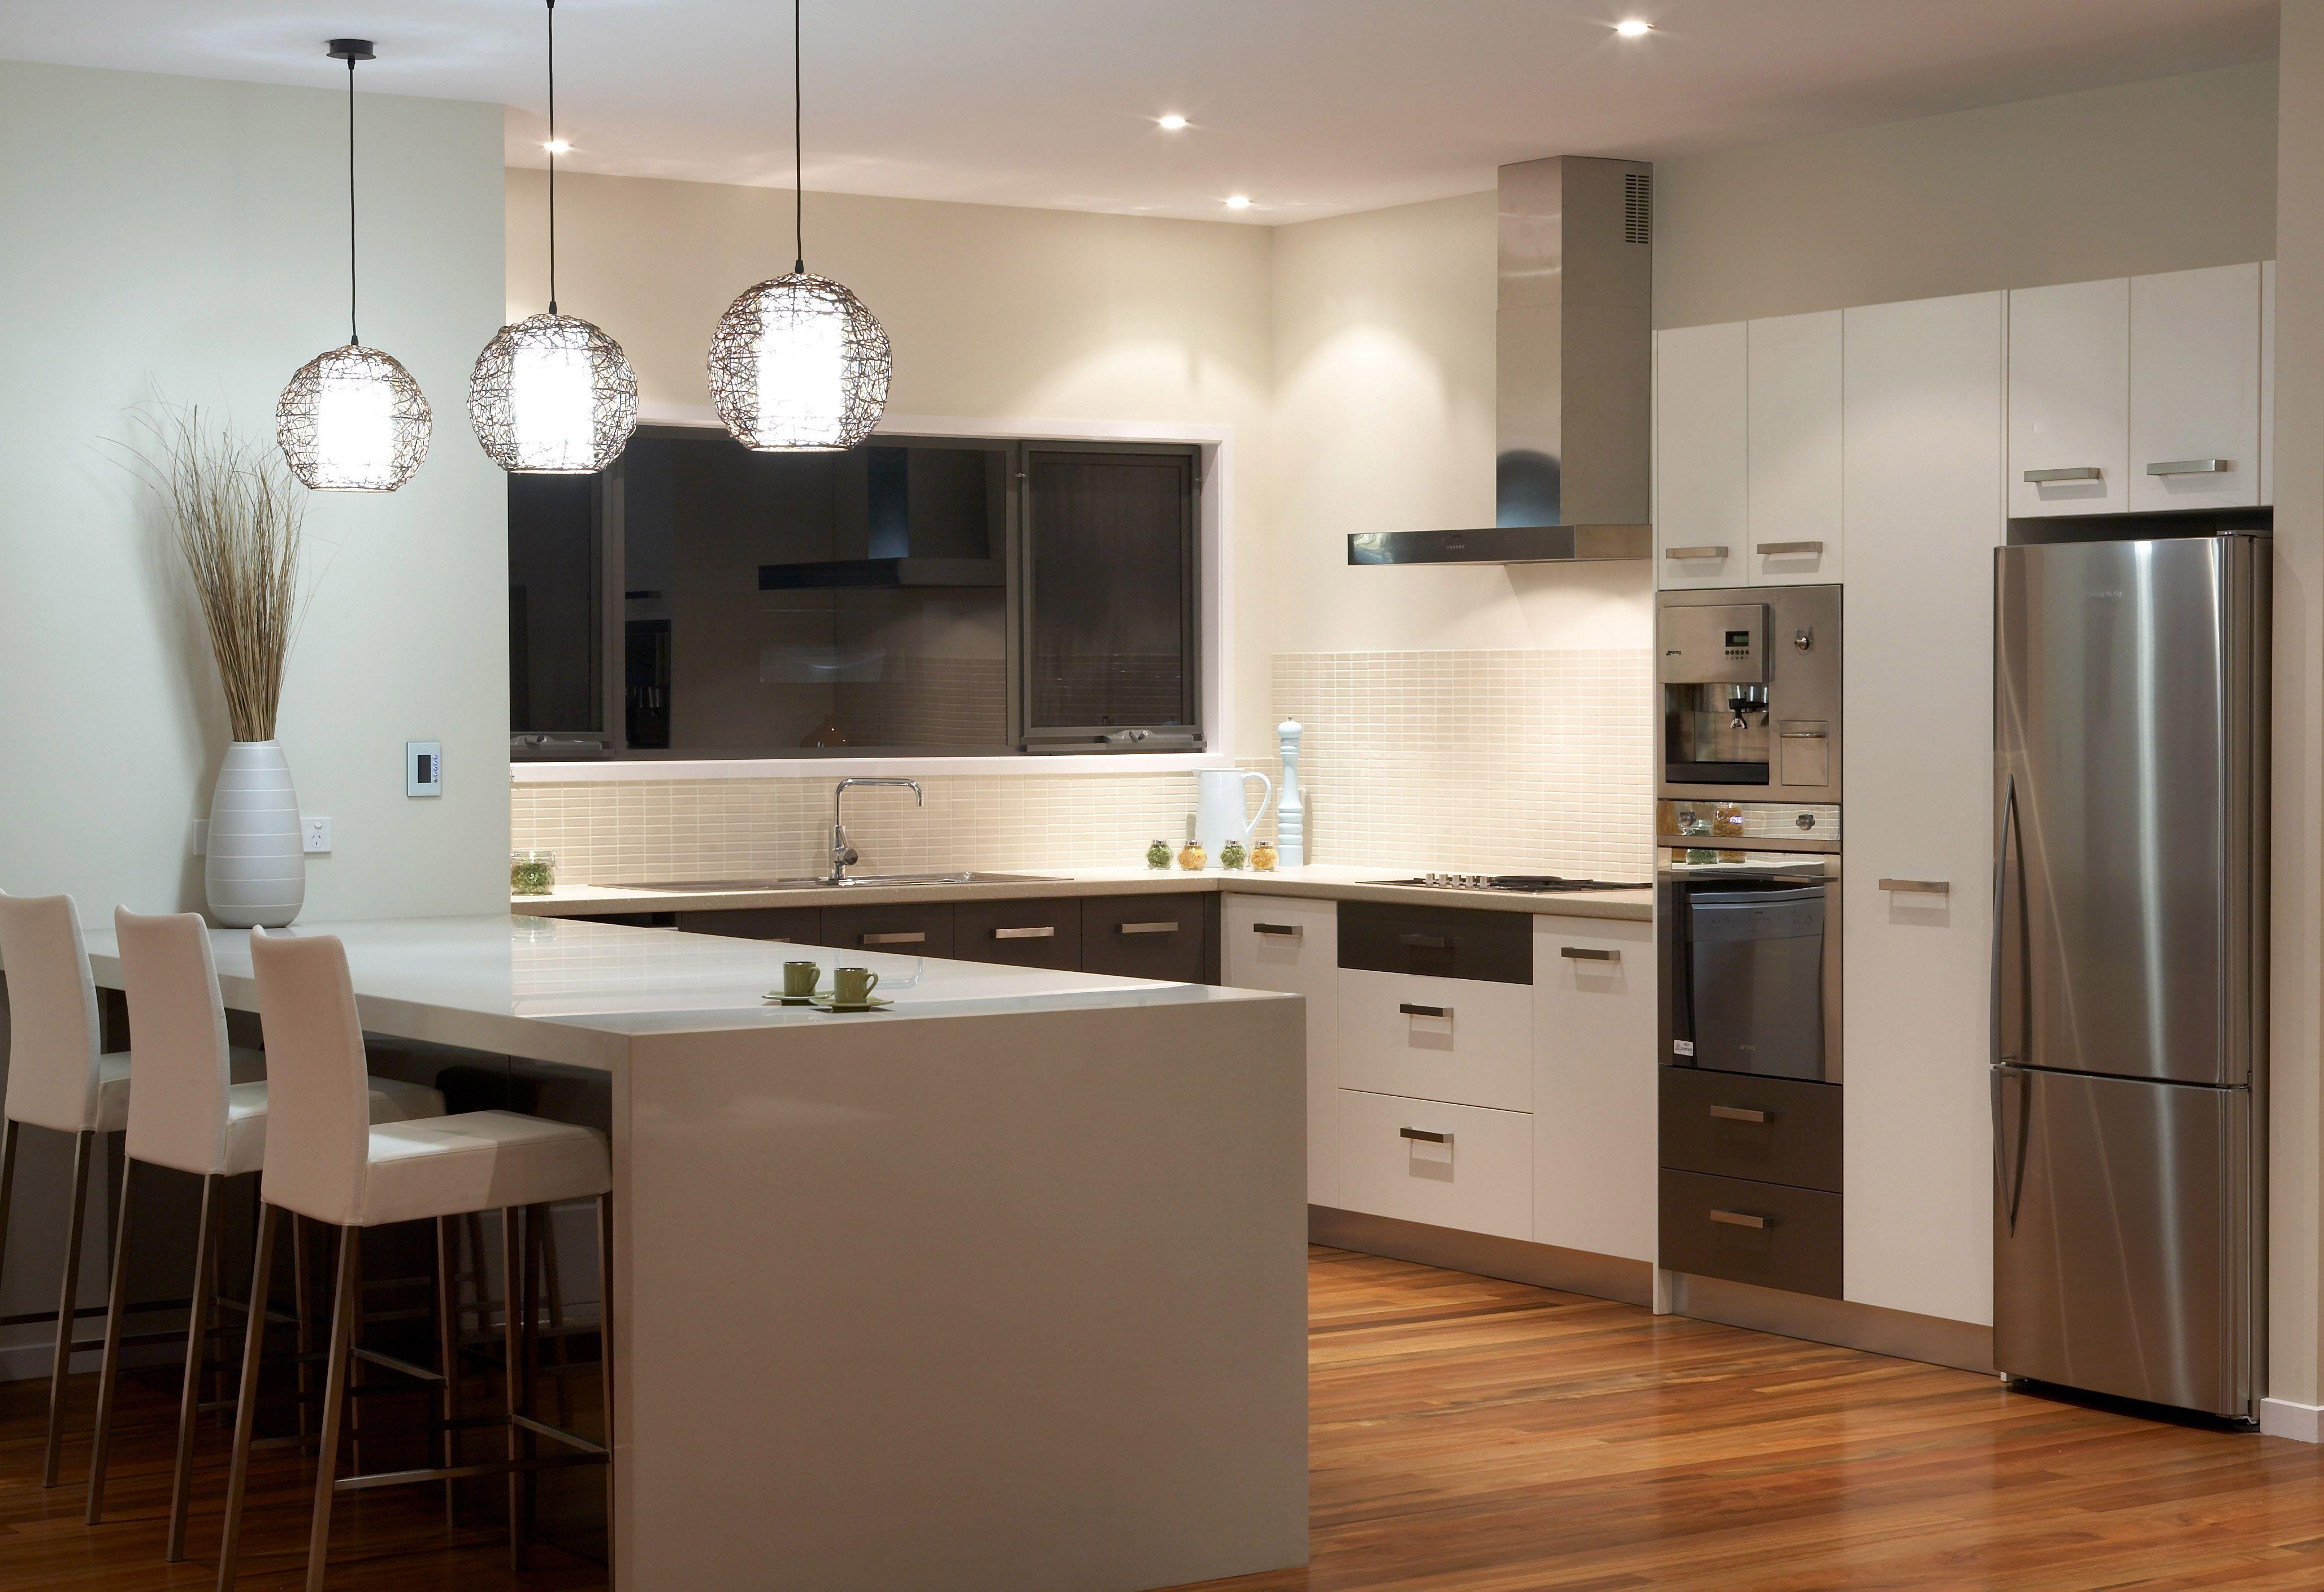 Kitchen inspiration from the Hotondo Homes Beachview display home ...